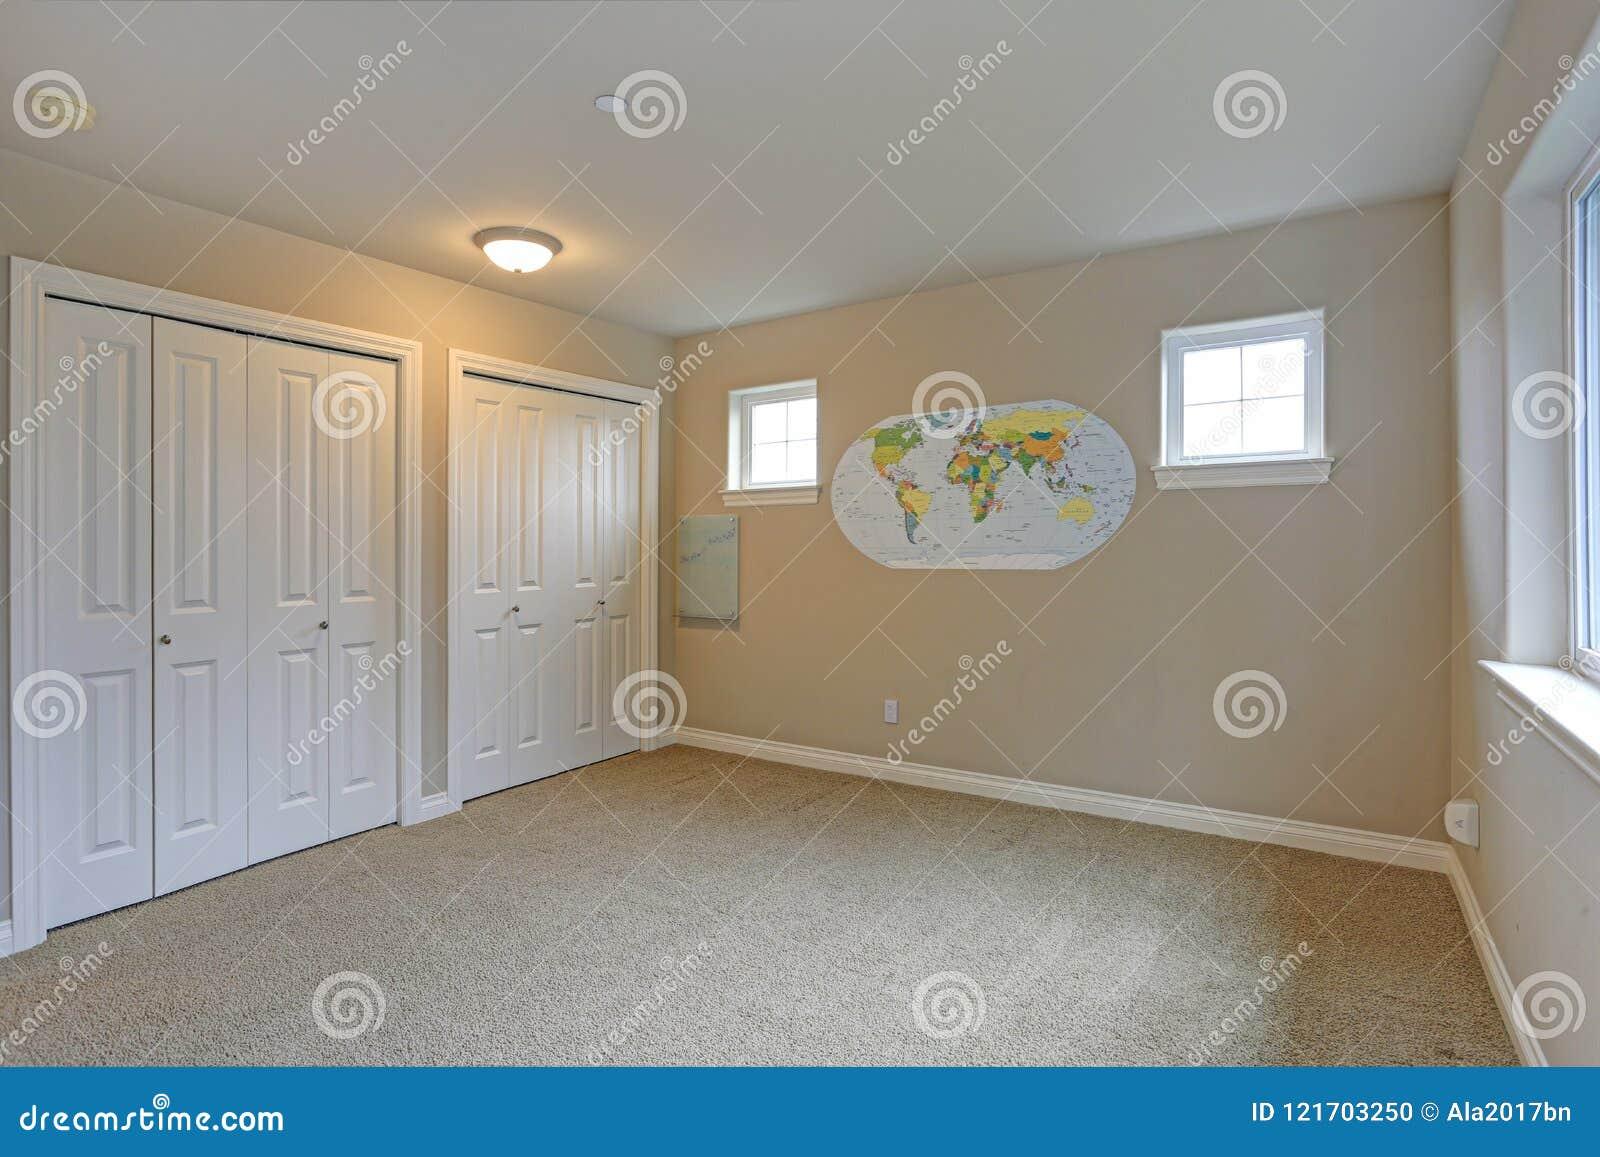 Light beige room interior with white closet doors.